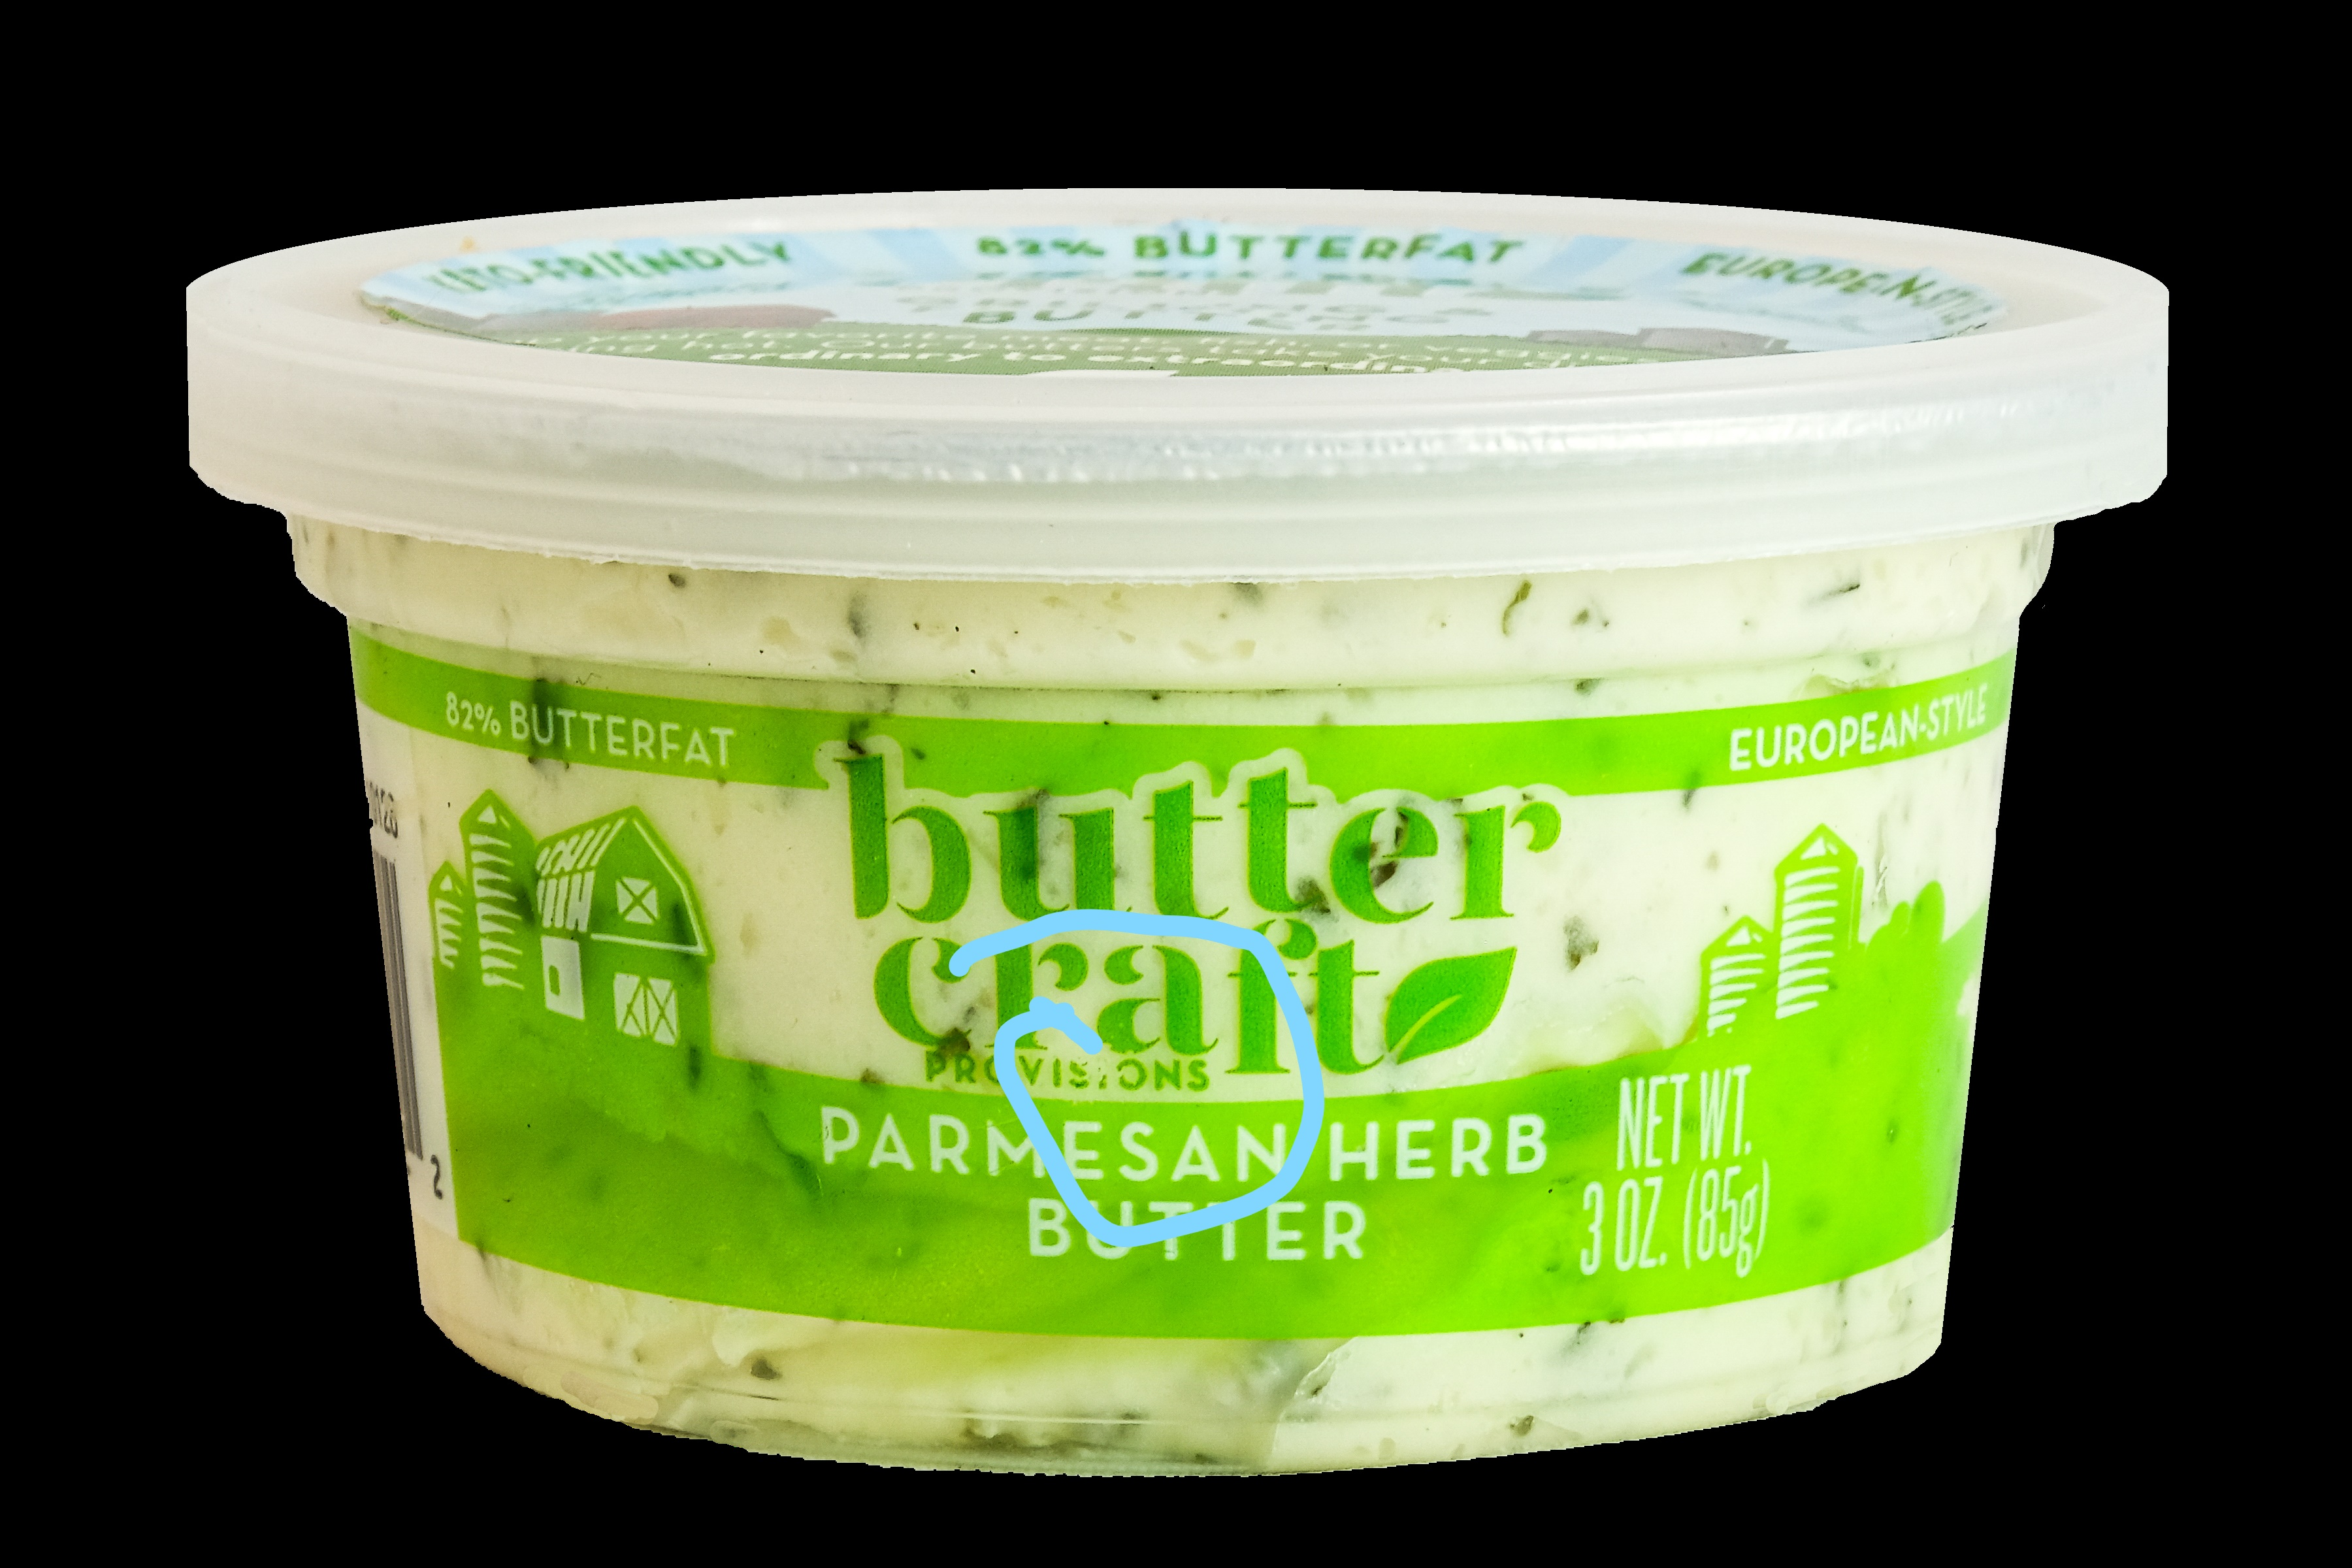 Parmesan Herb Butter